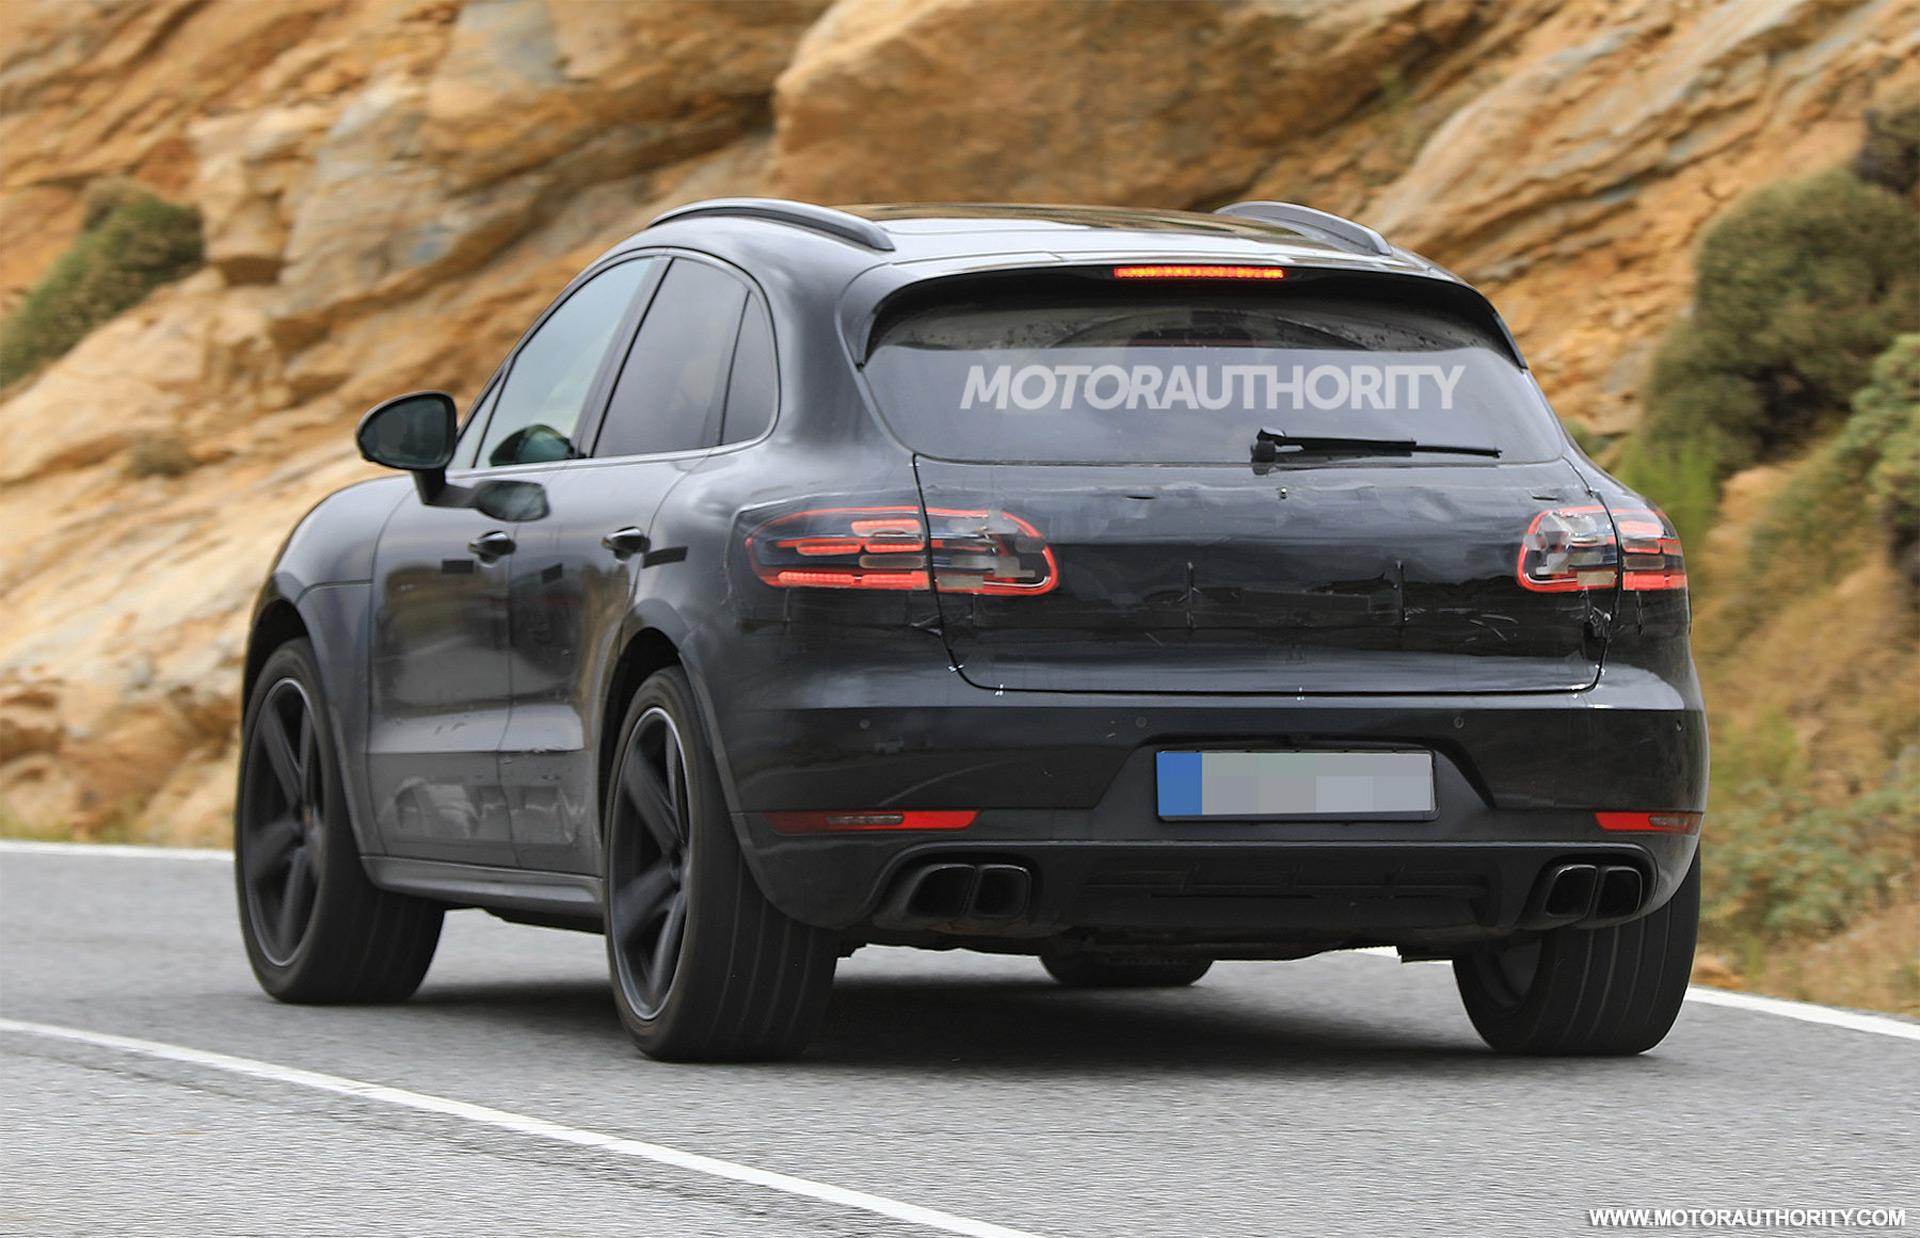 2019 Porsche Macan spy shots and video | Autozaurus